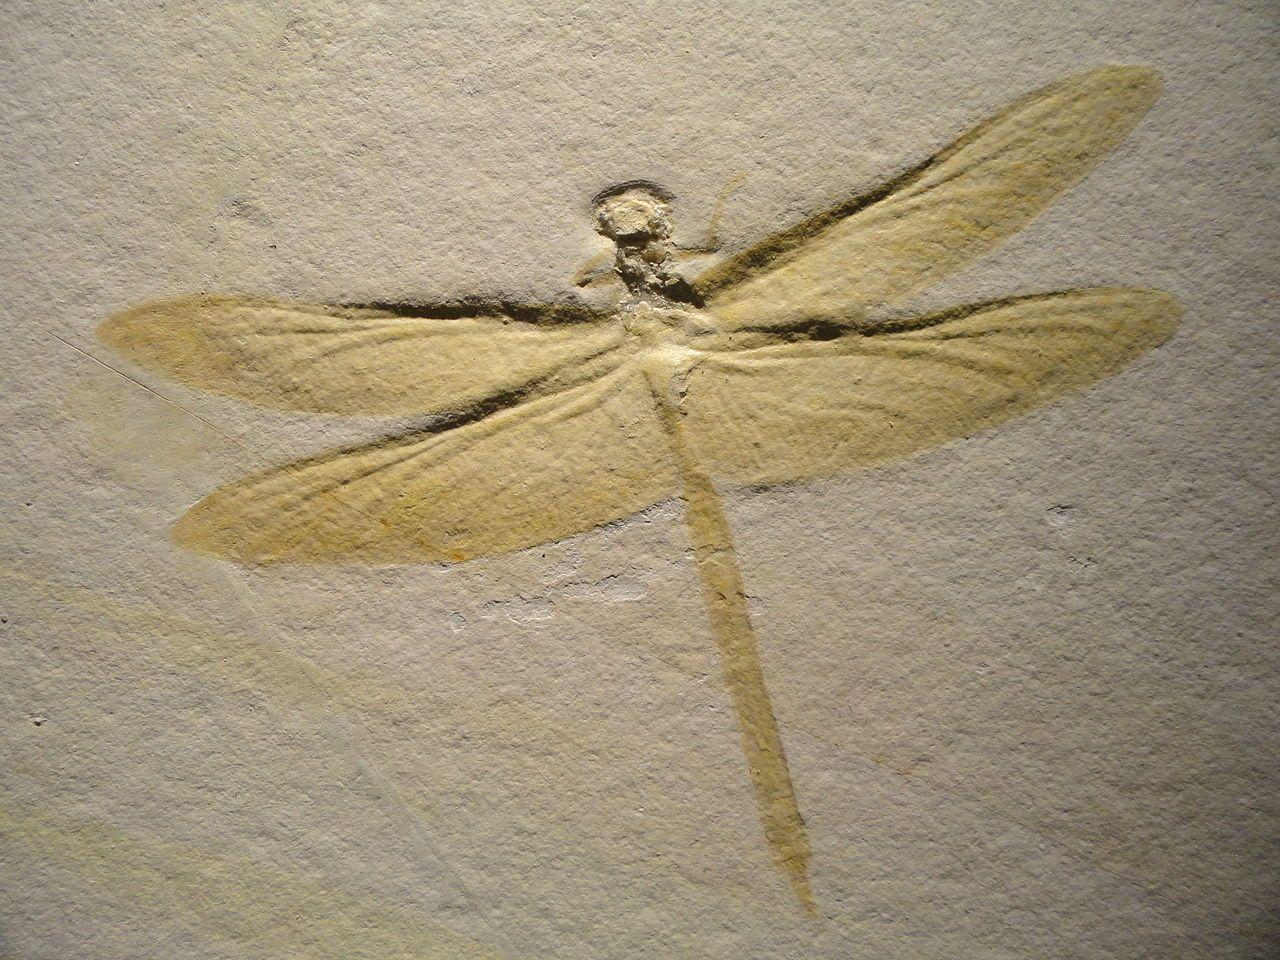 Mesurupetala Dragonfly Late Late Jurassic Tithonian Age Solnhofen Lithographic Limestone Solnhofen Bavaria Germany Houston Museum O Fossils Seide